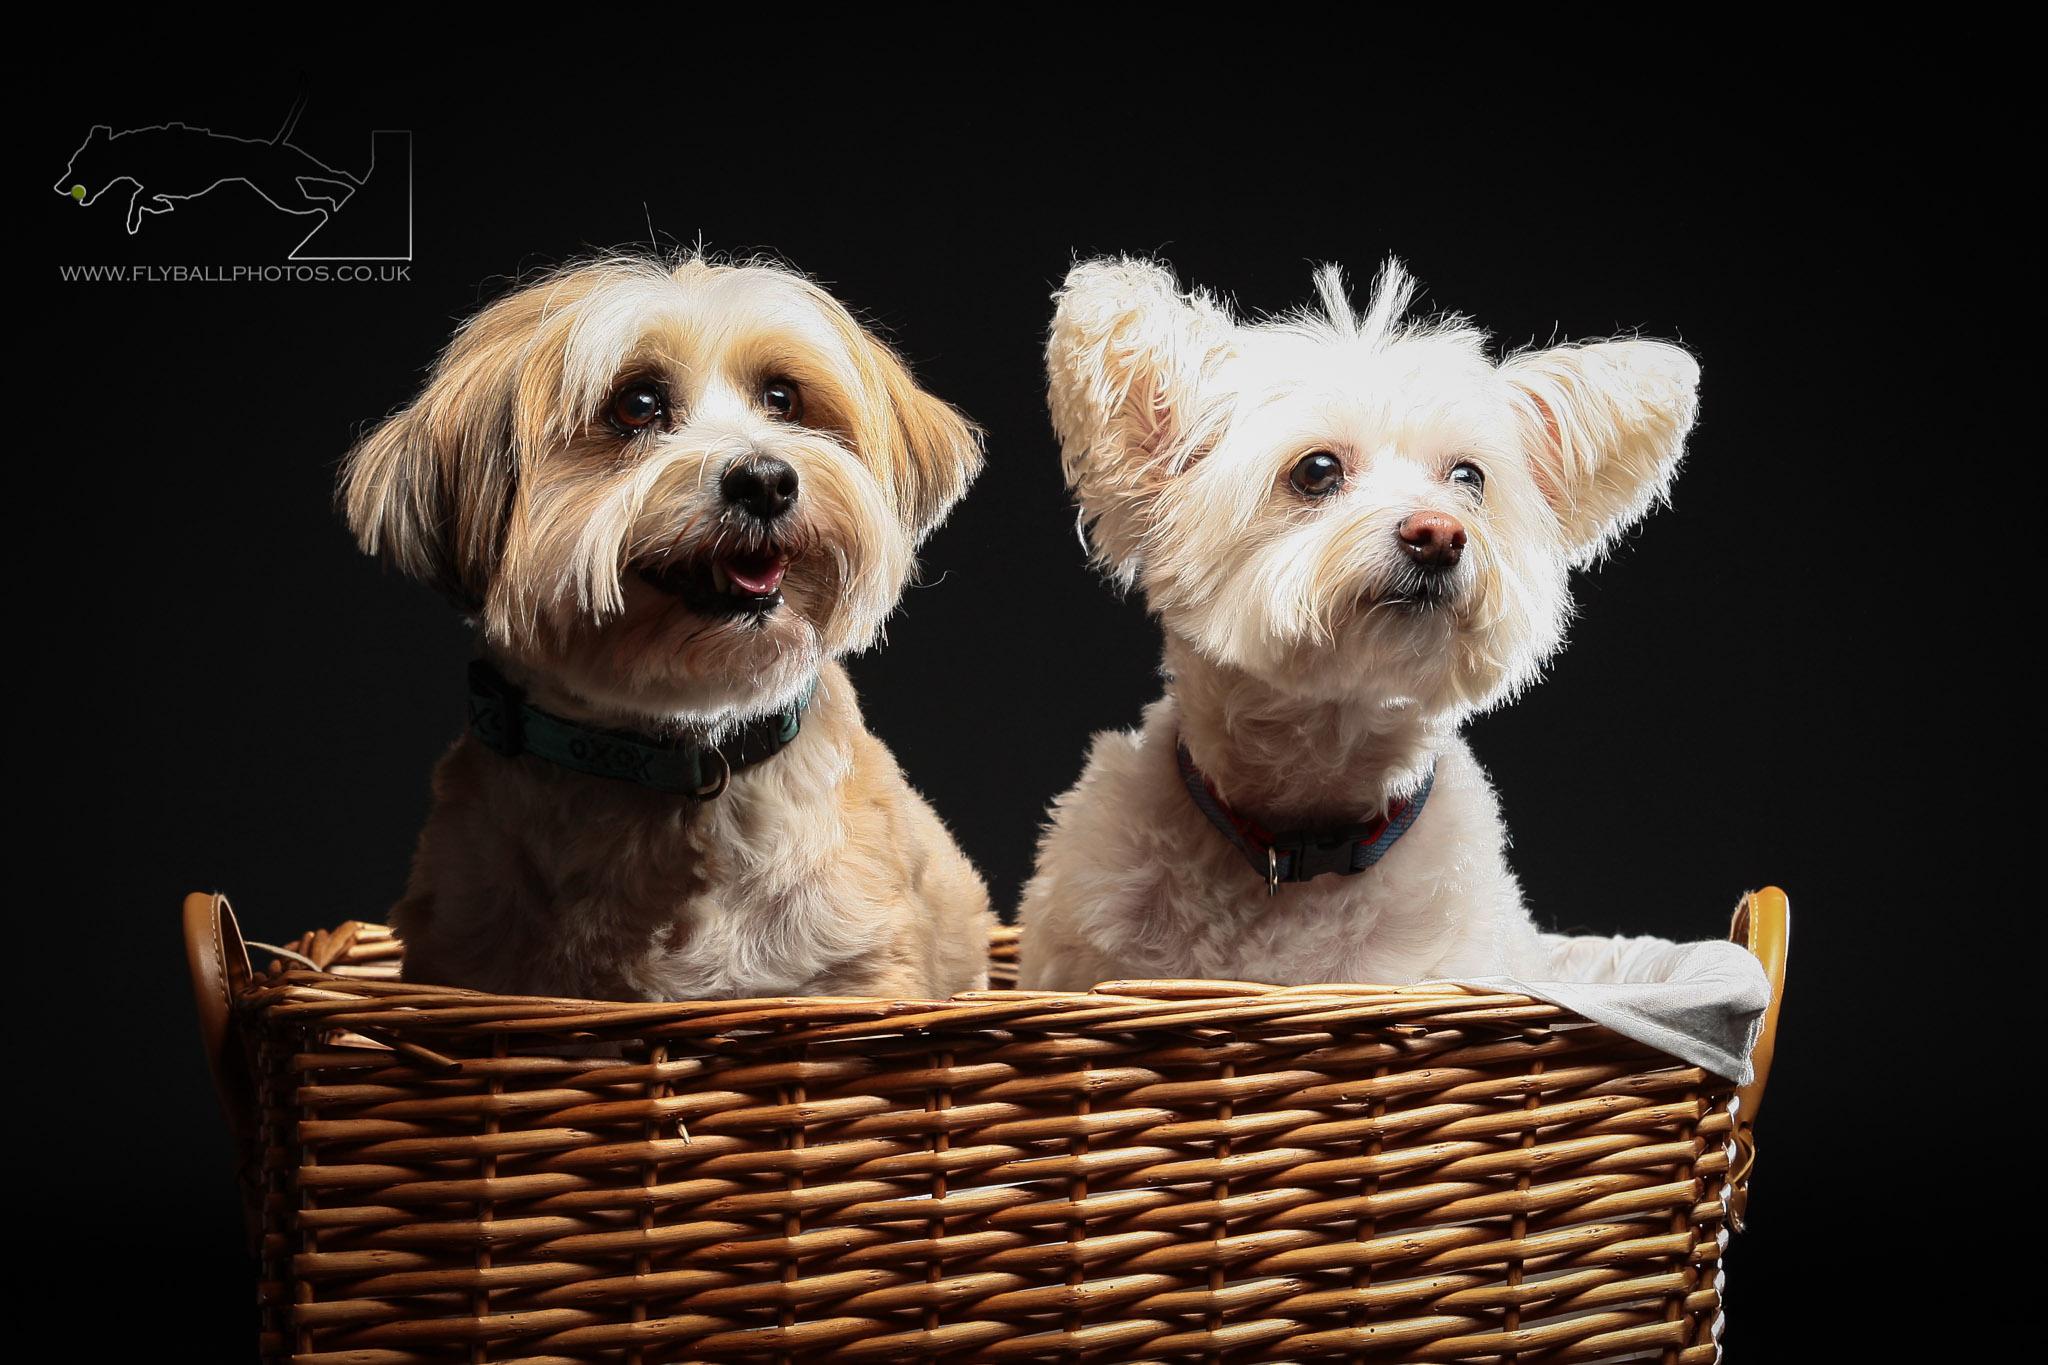 winchelsea pups